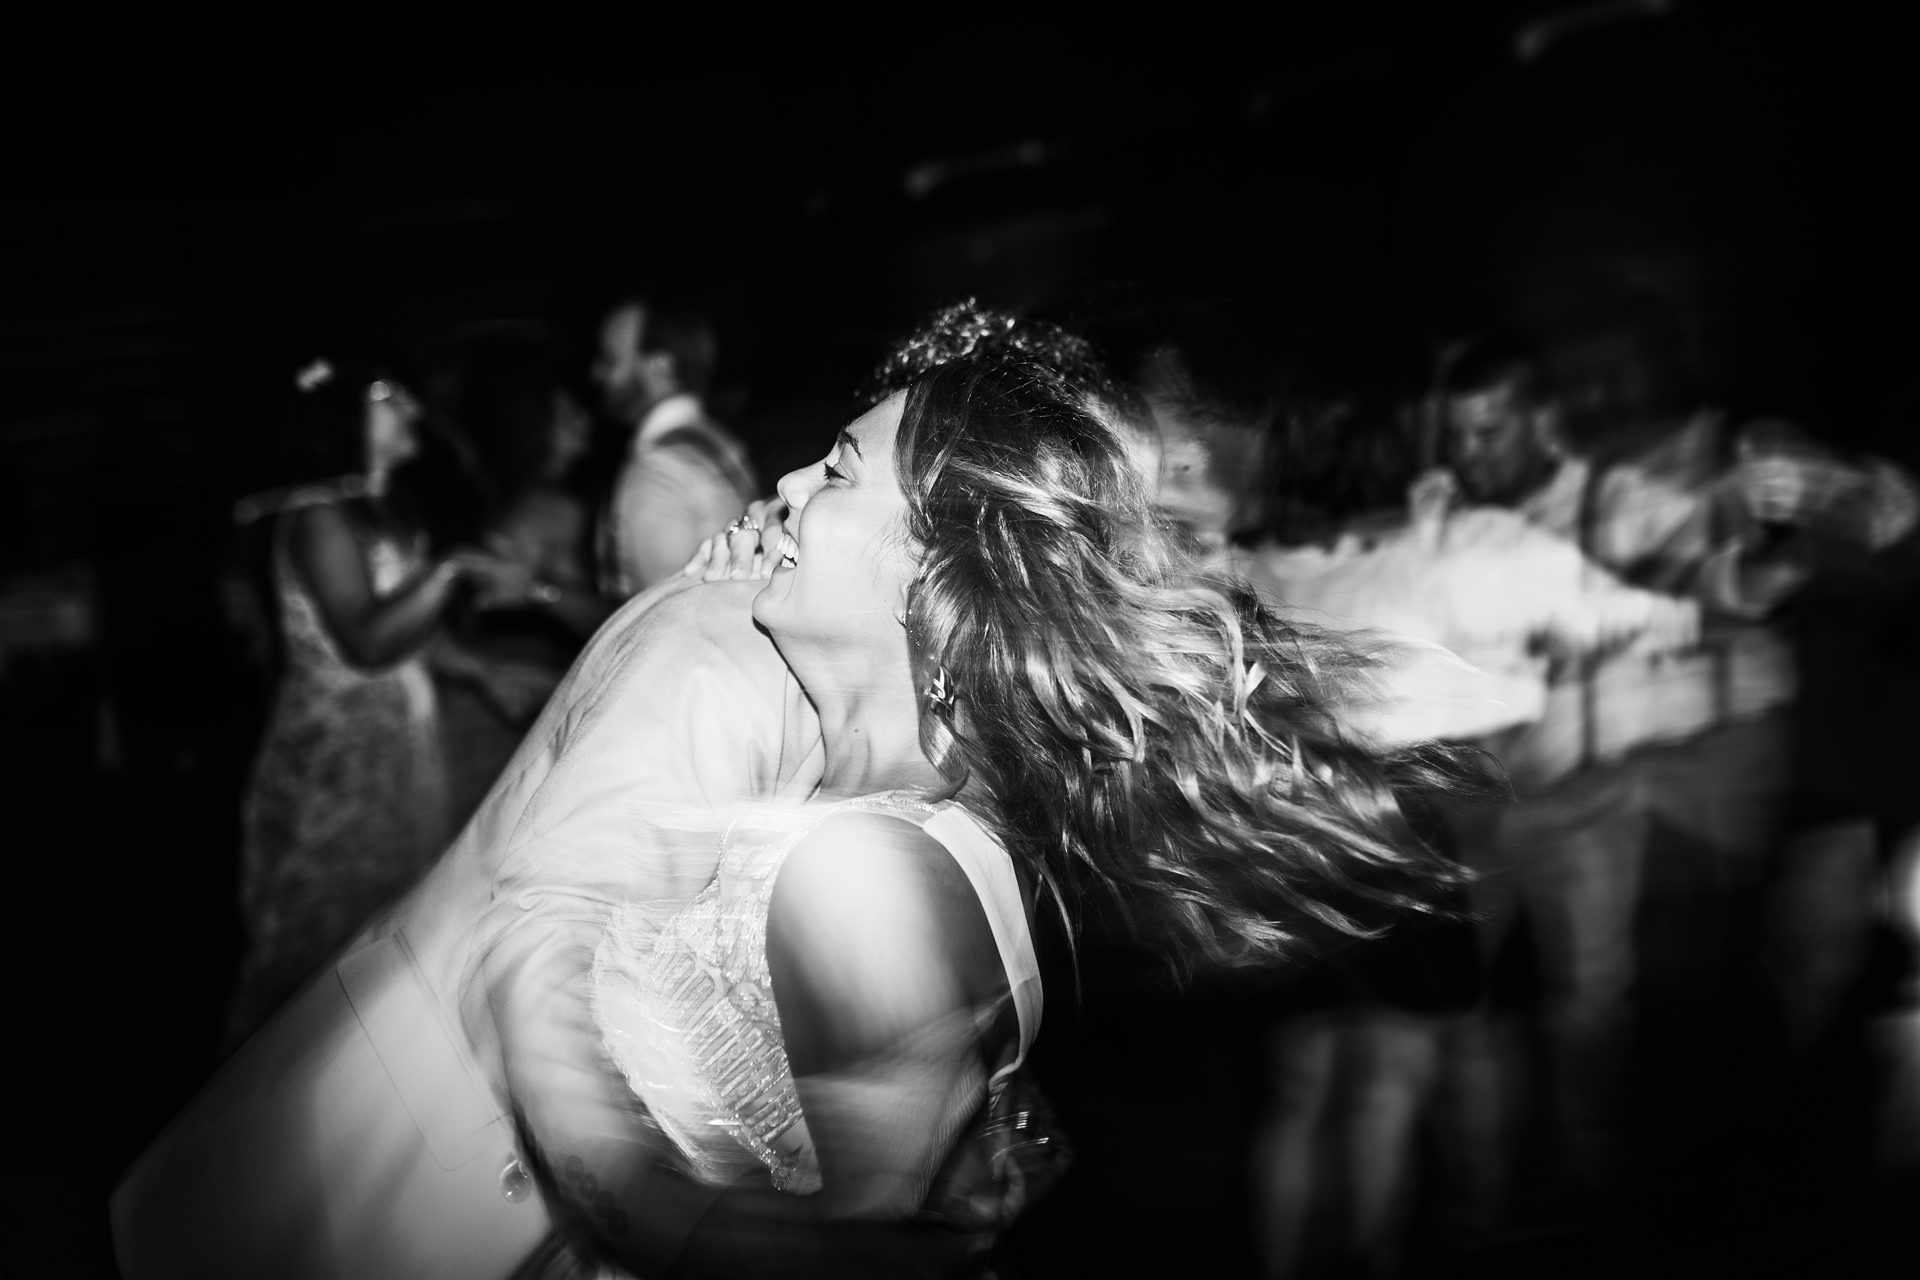 Matthieu Chandelier photographe mariage en Savoie à Chambéry